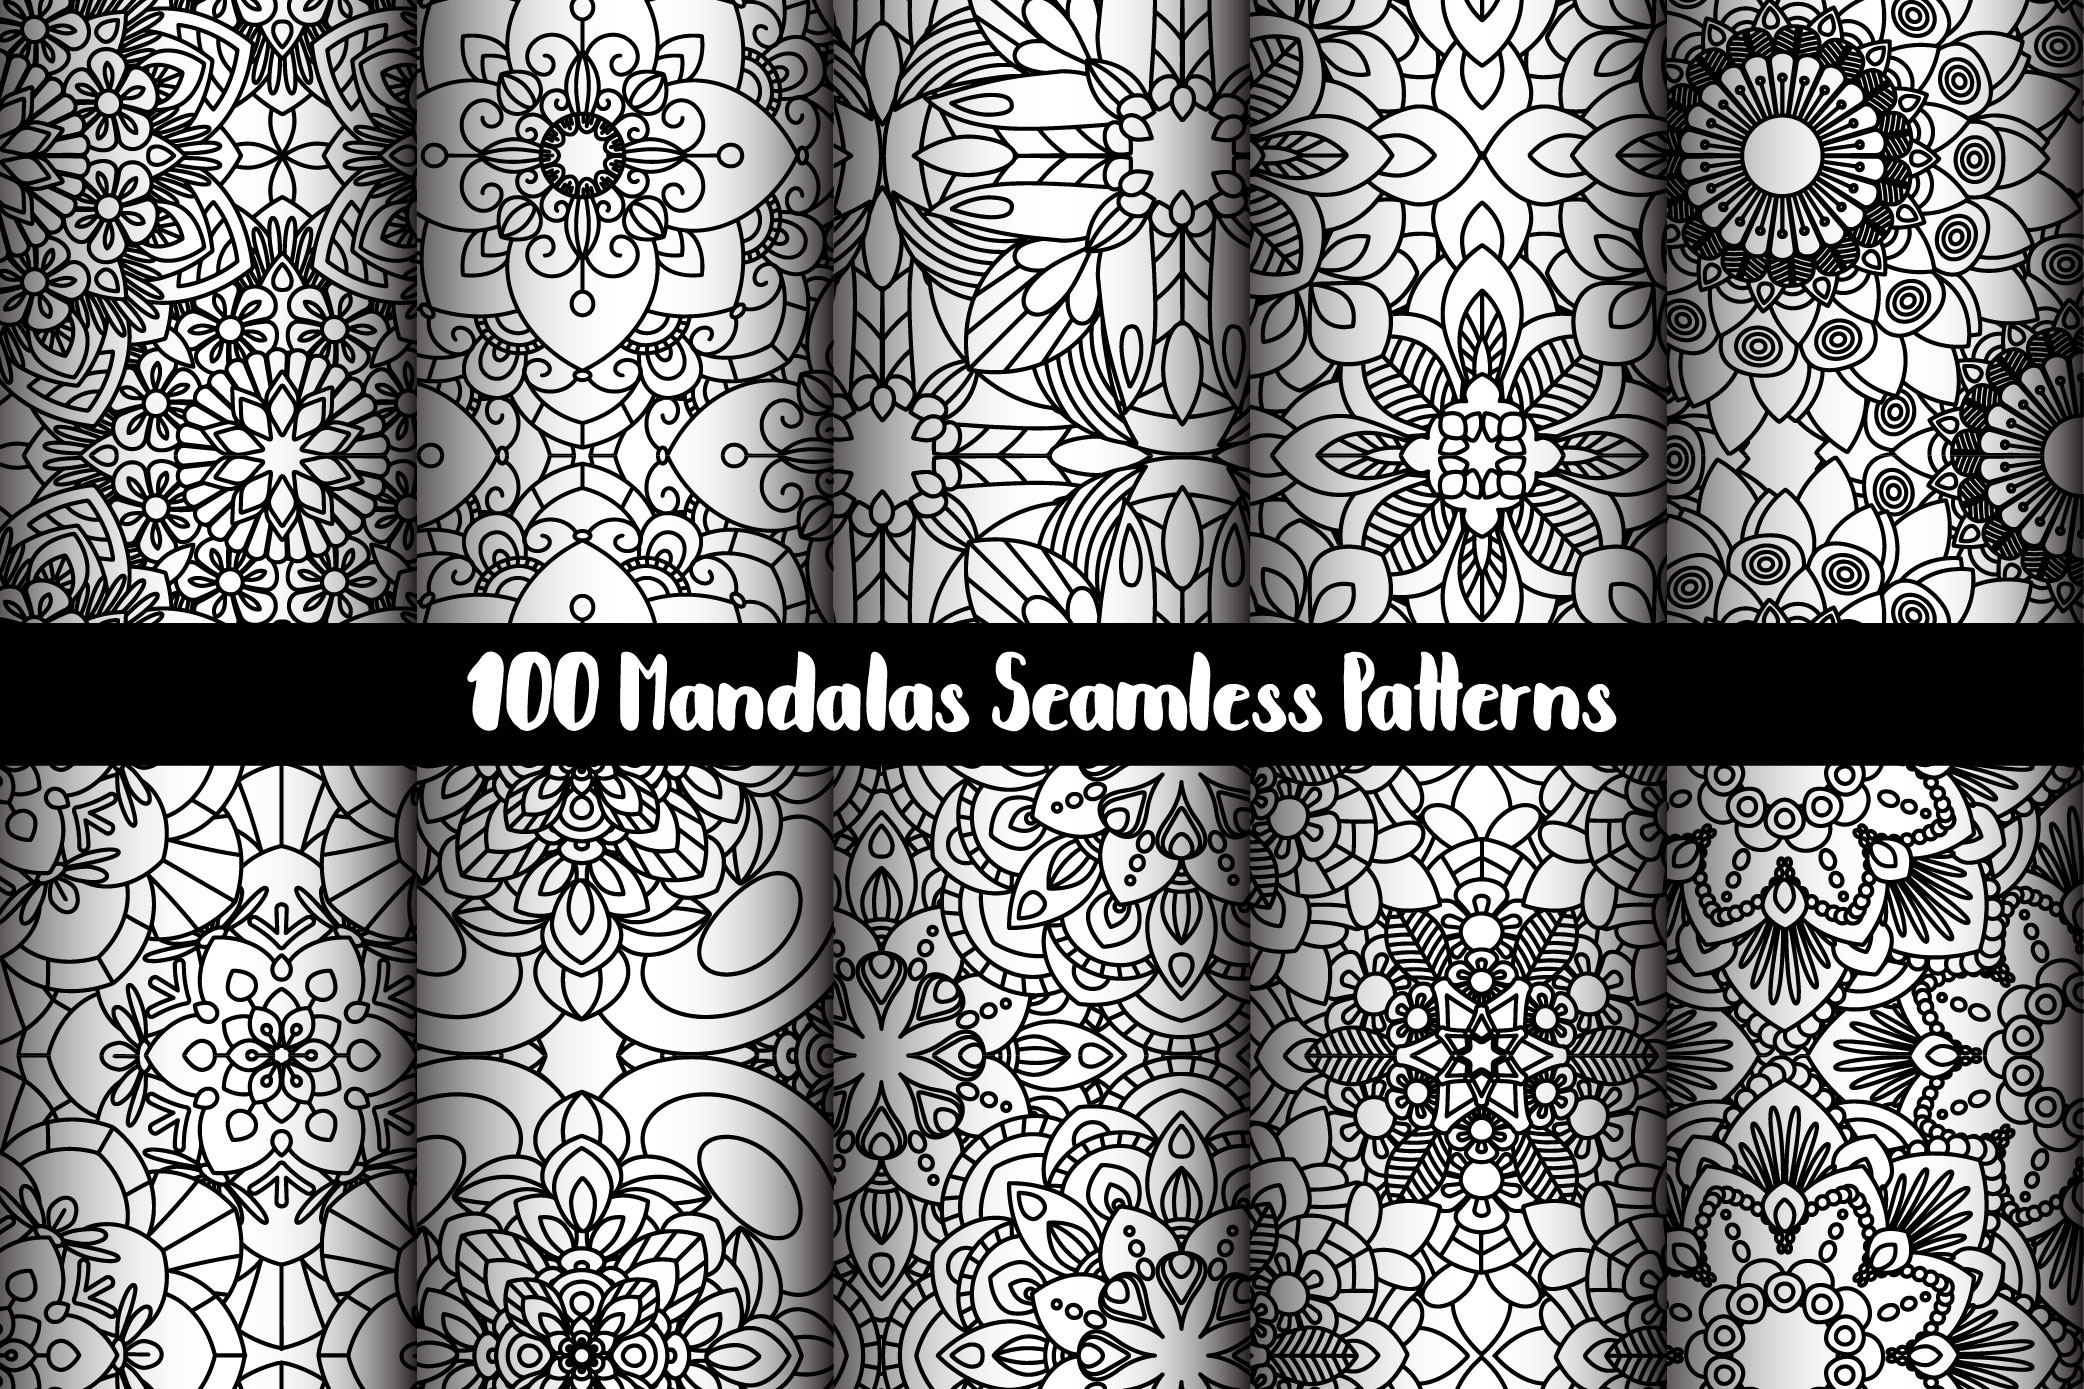 100 Mandalas Seamless Patterns example image 11